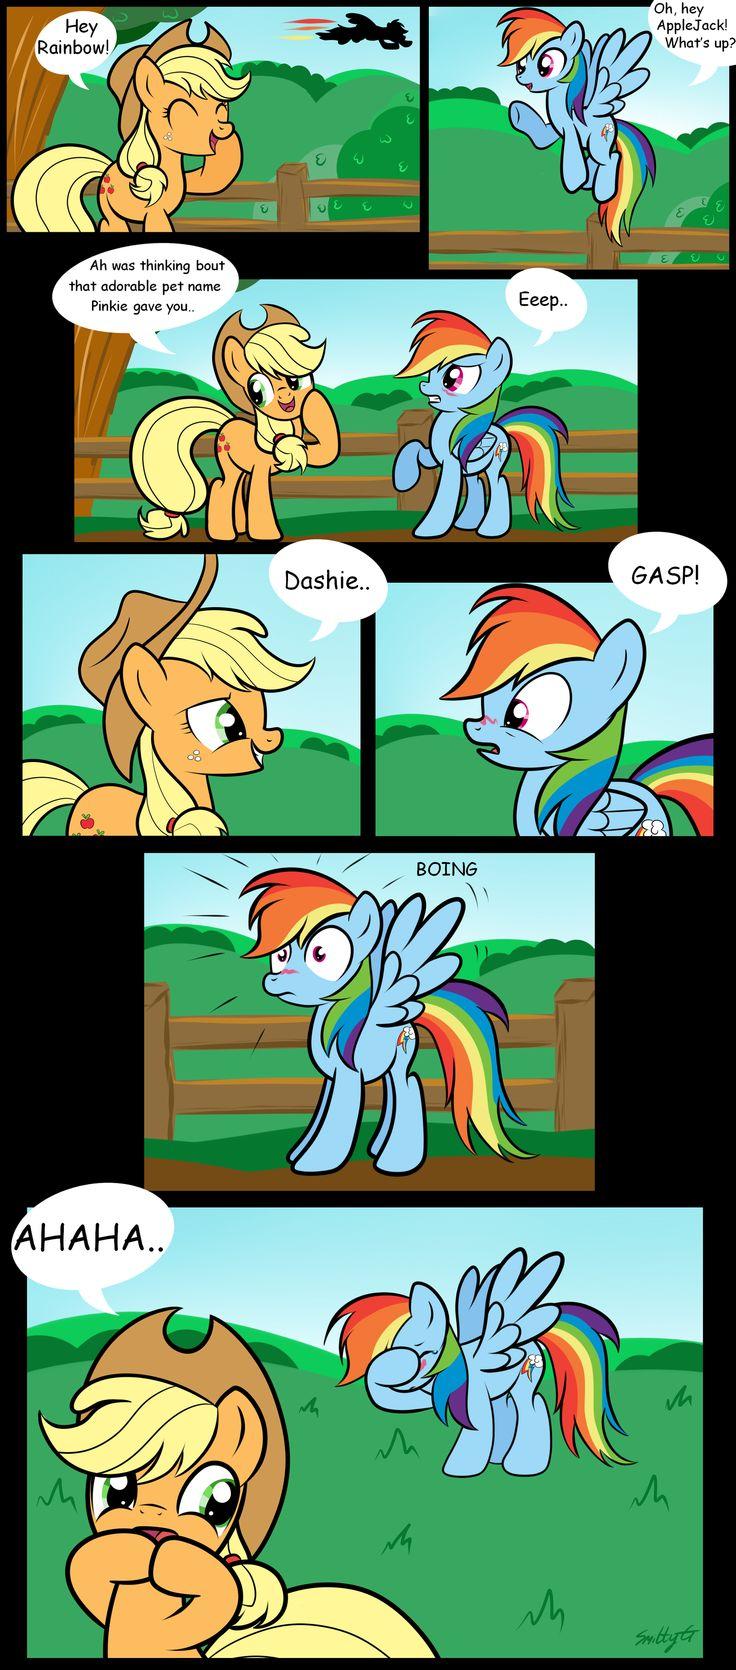 Rainbow Dash and AppleJack by SmittyG.deviantart.com on @deviantART